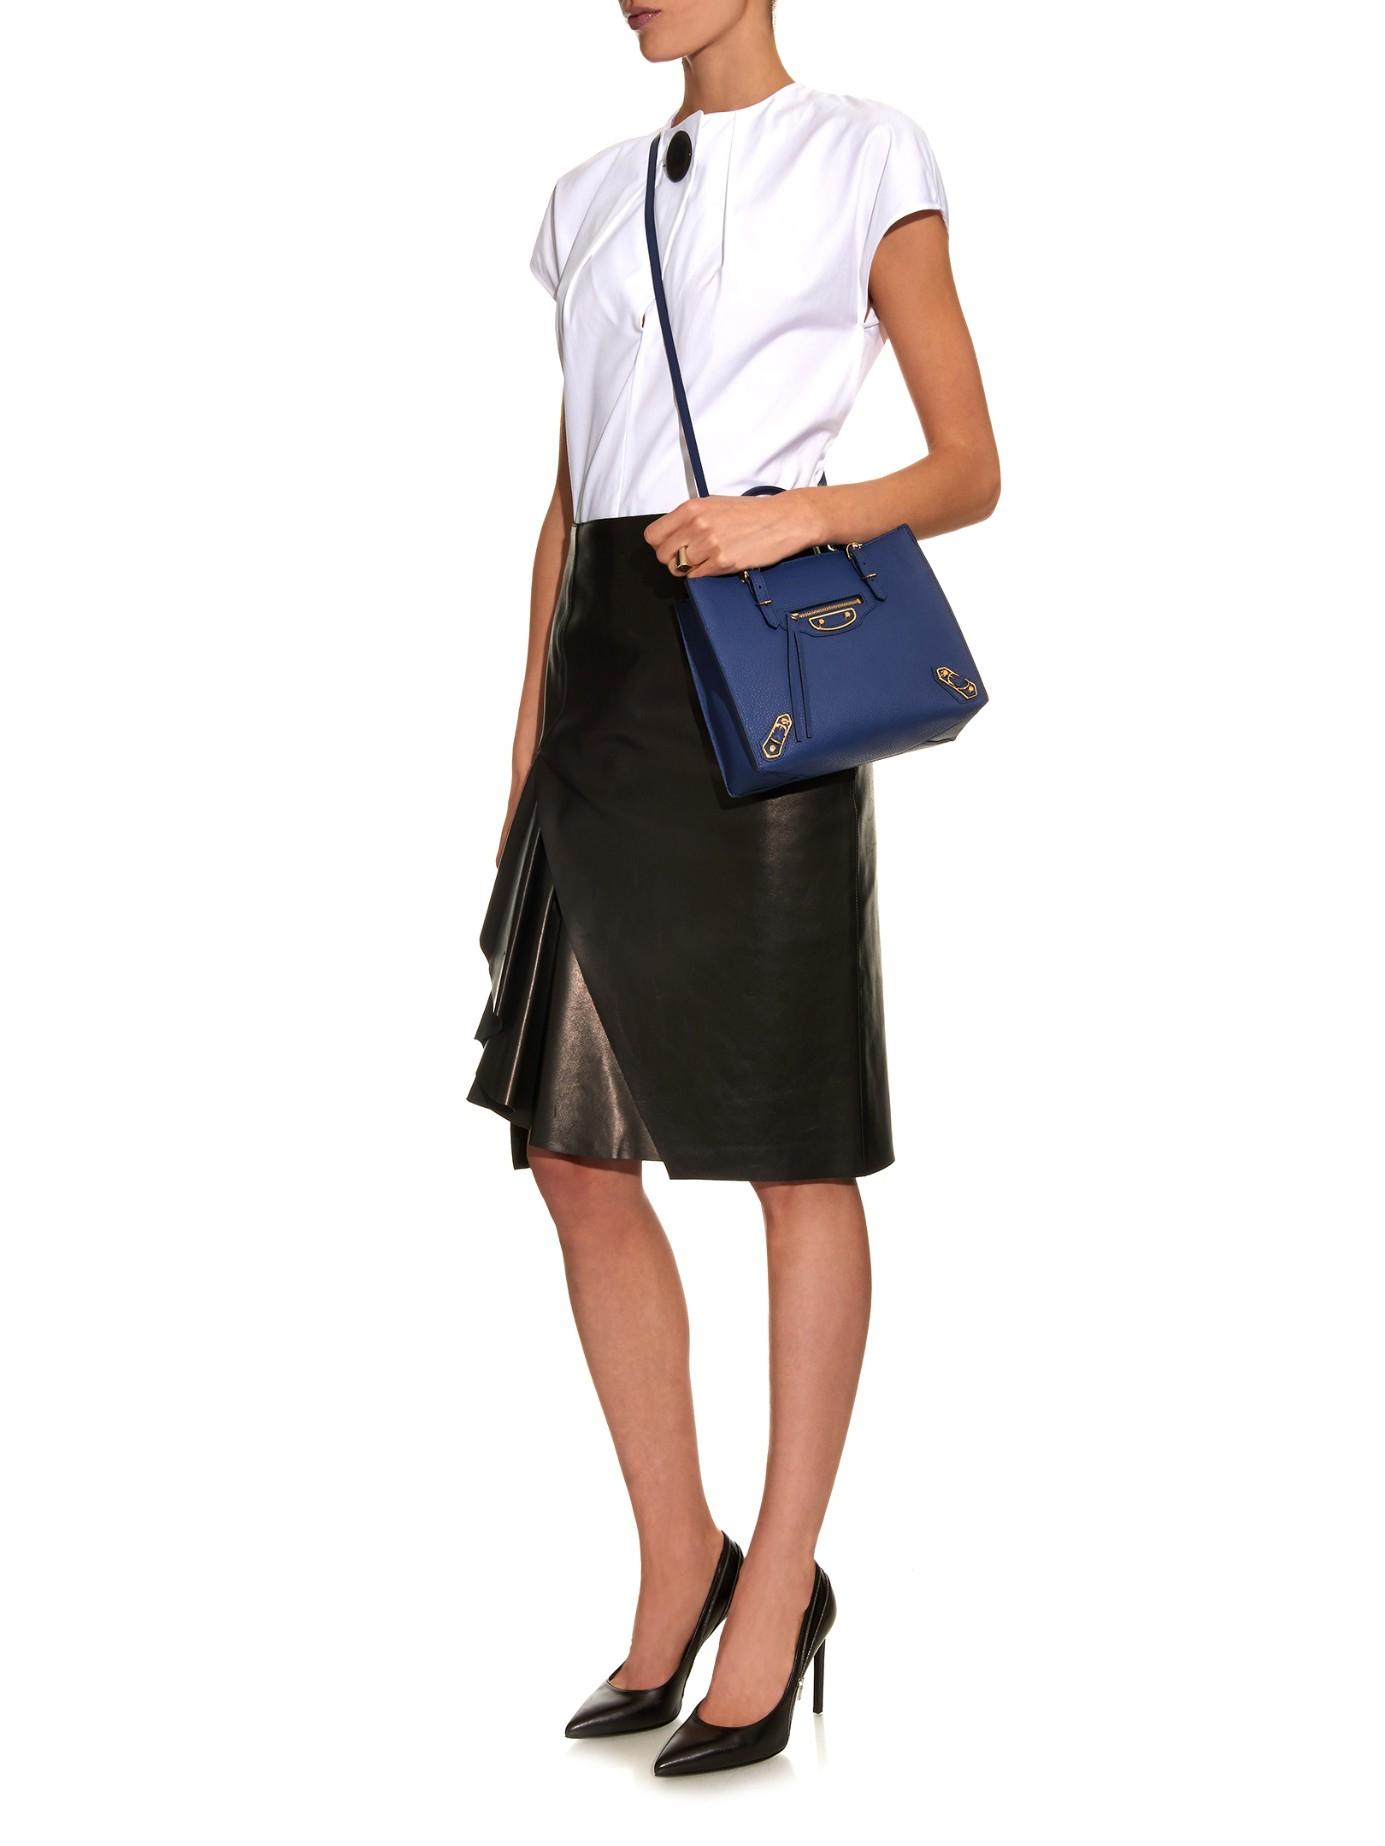 8f73a382d74 Balenciaga Papier A6 Metallic-edge Leather Shoulder Bag in Blue - Lyst